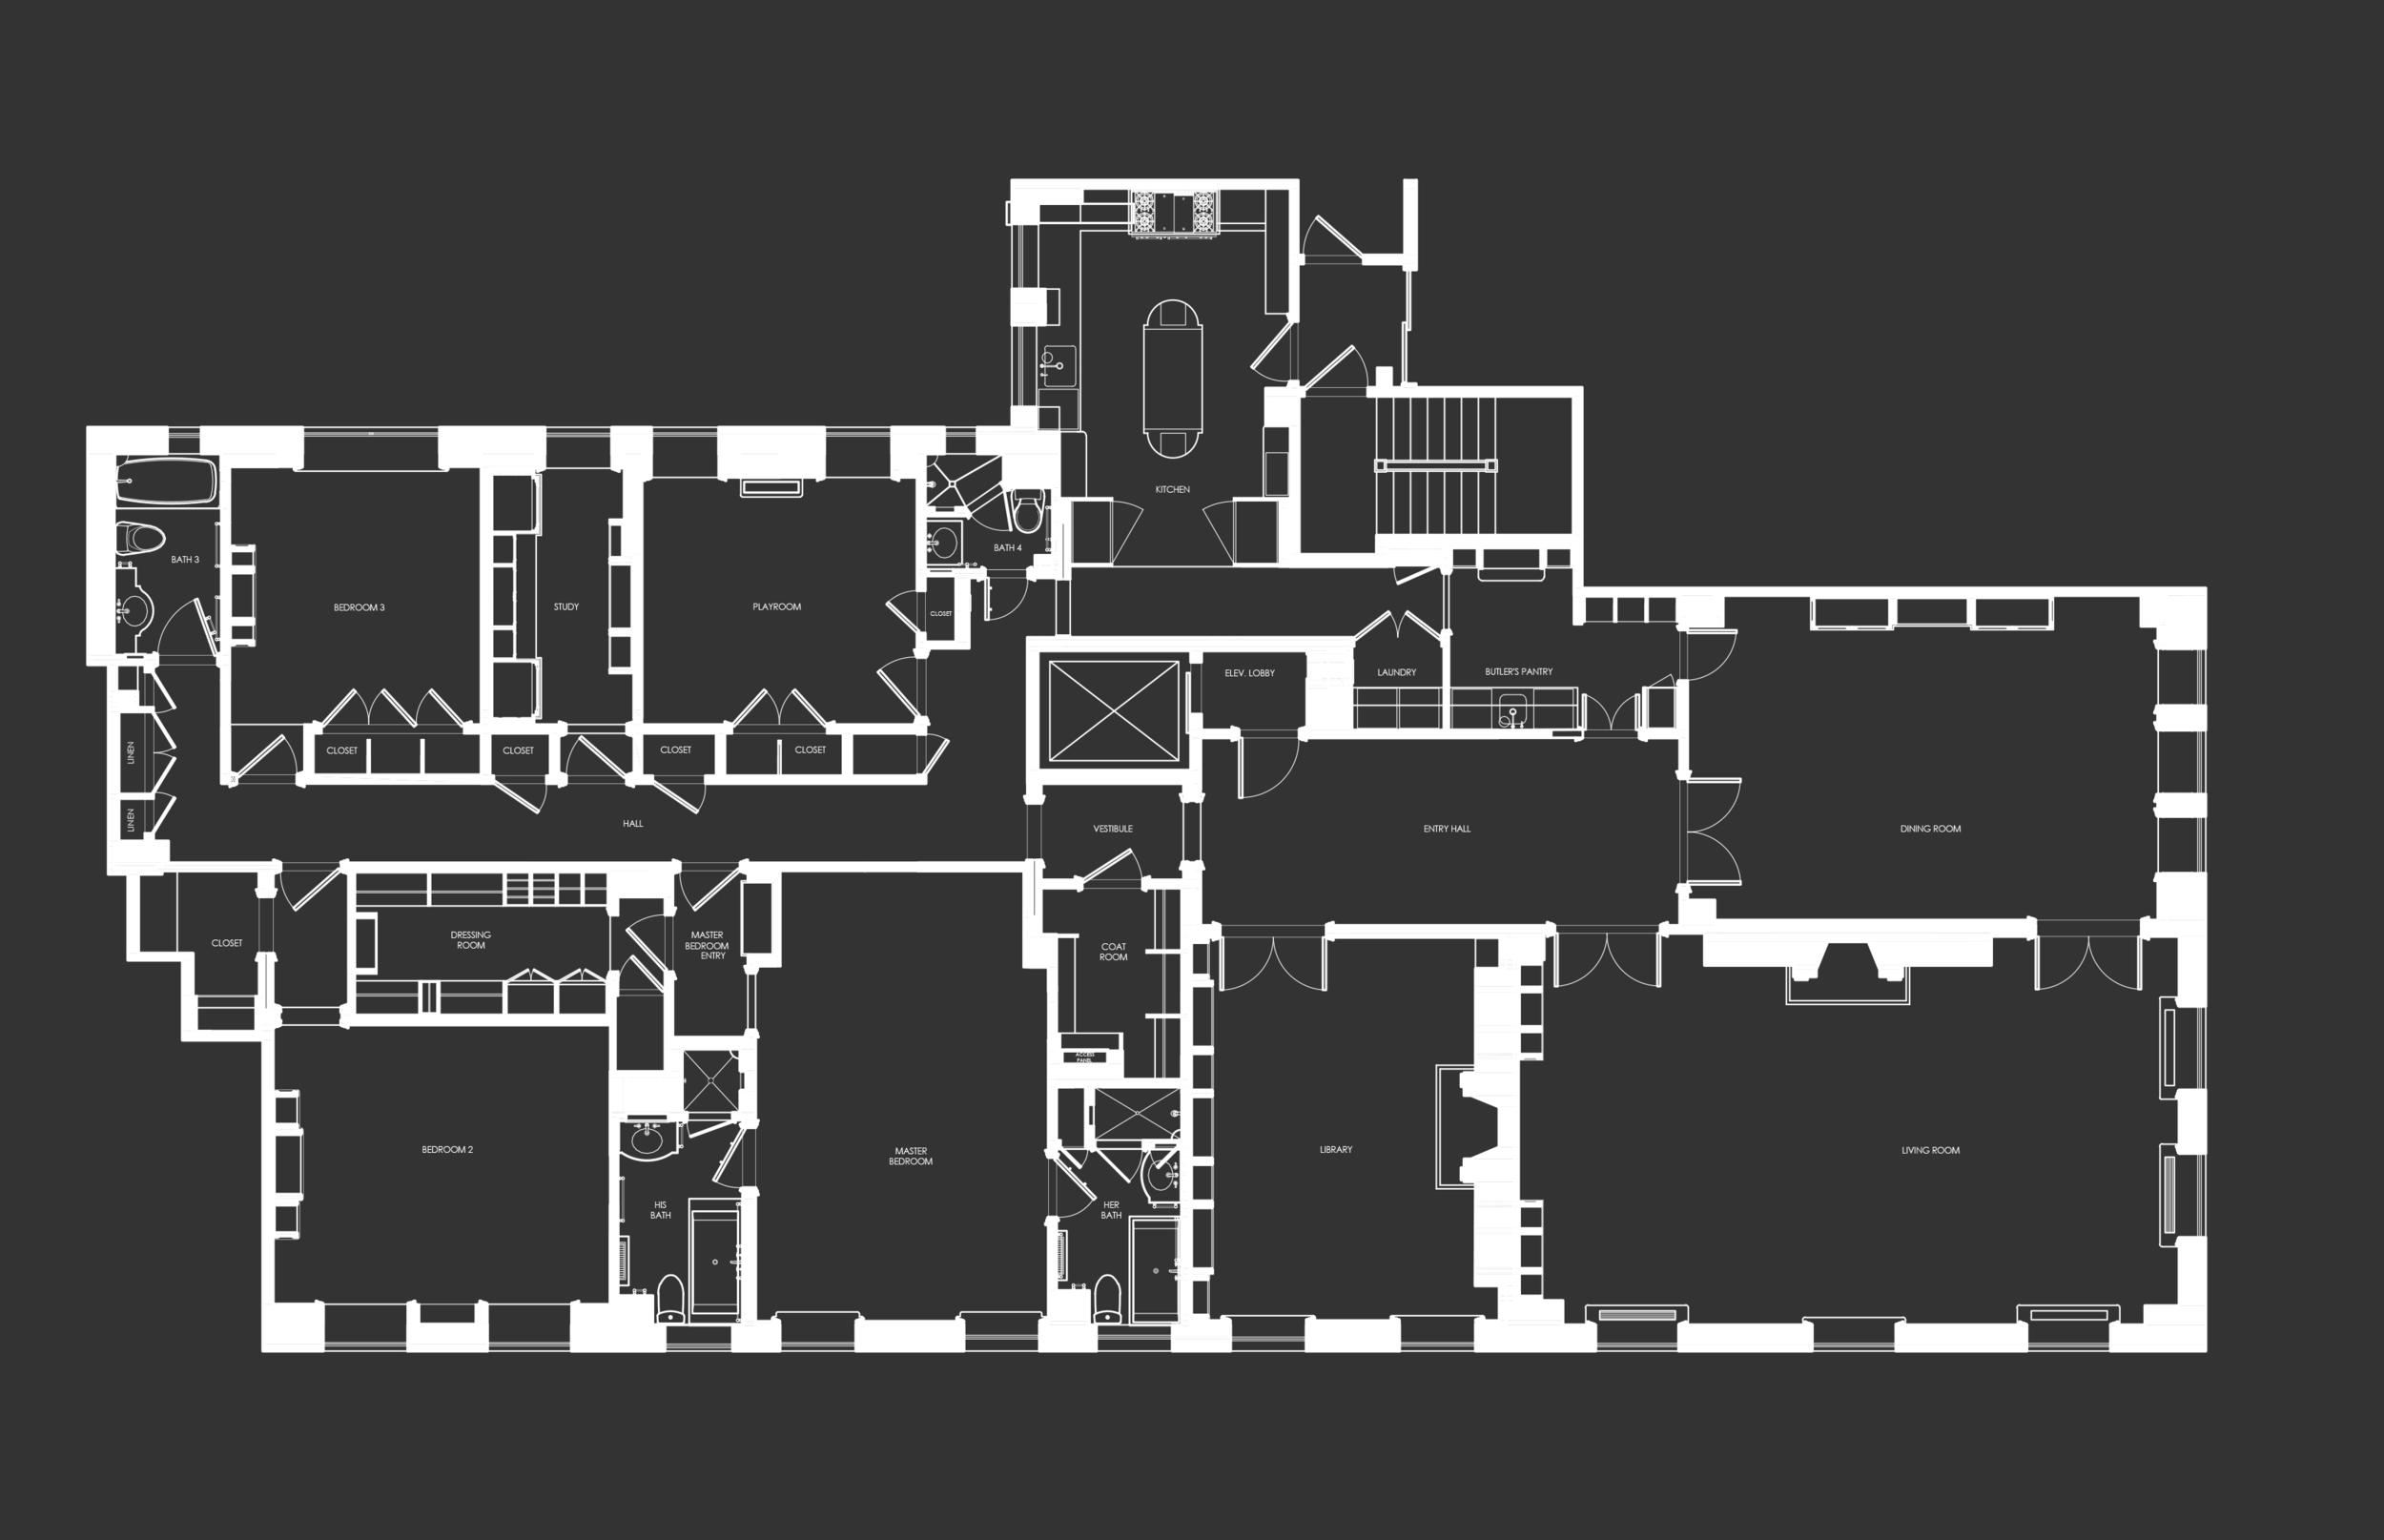 13 PARK AVENUE RESIDENCE Floorplan.jpg